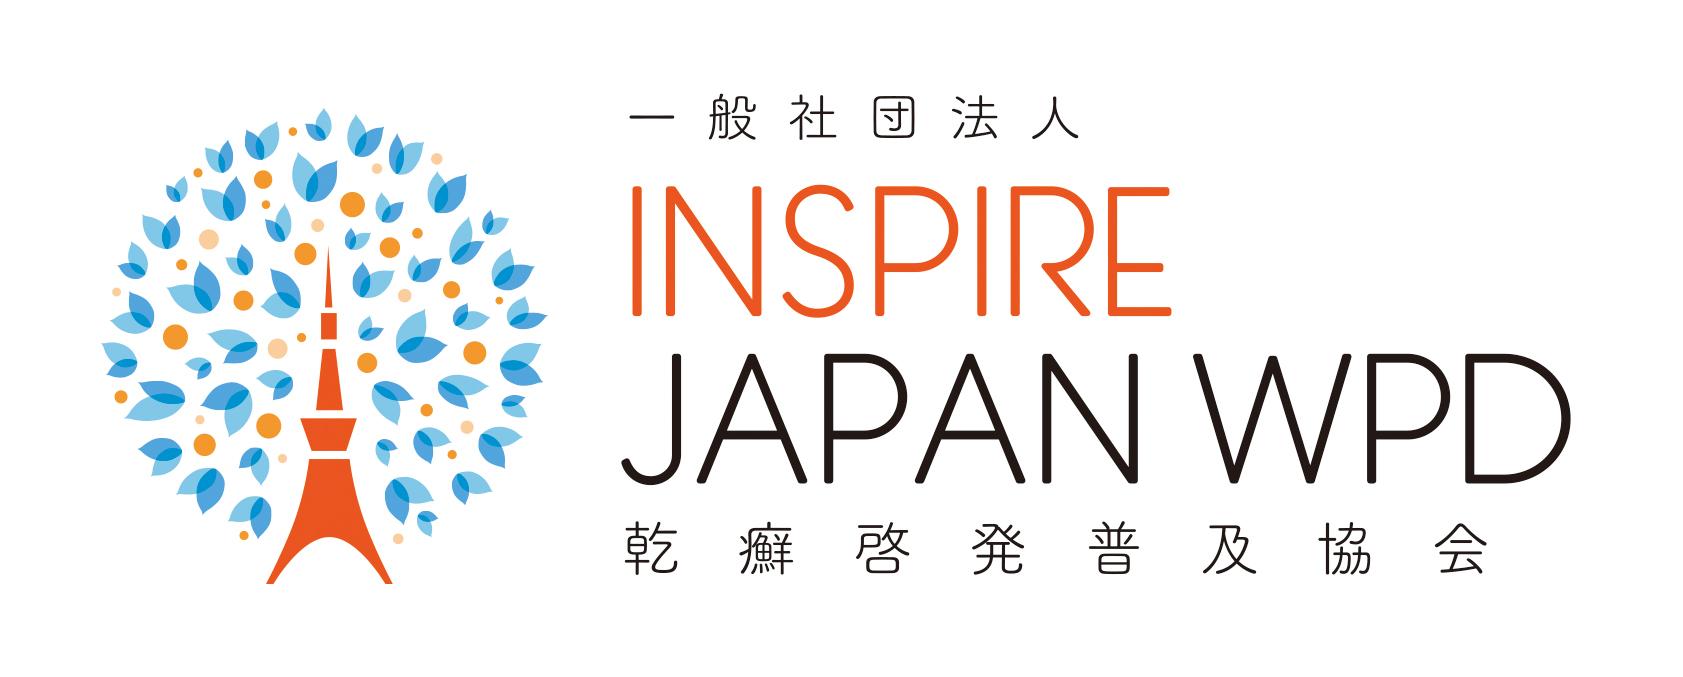 INSPIRE JAPAN WPD 乾癬啓発普及協会